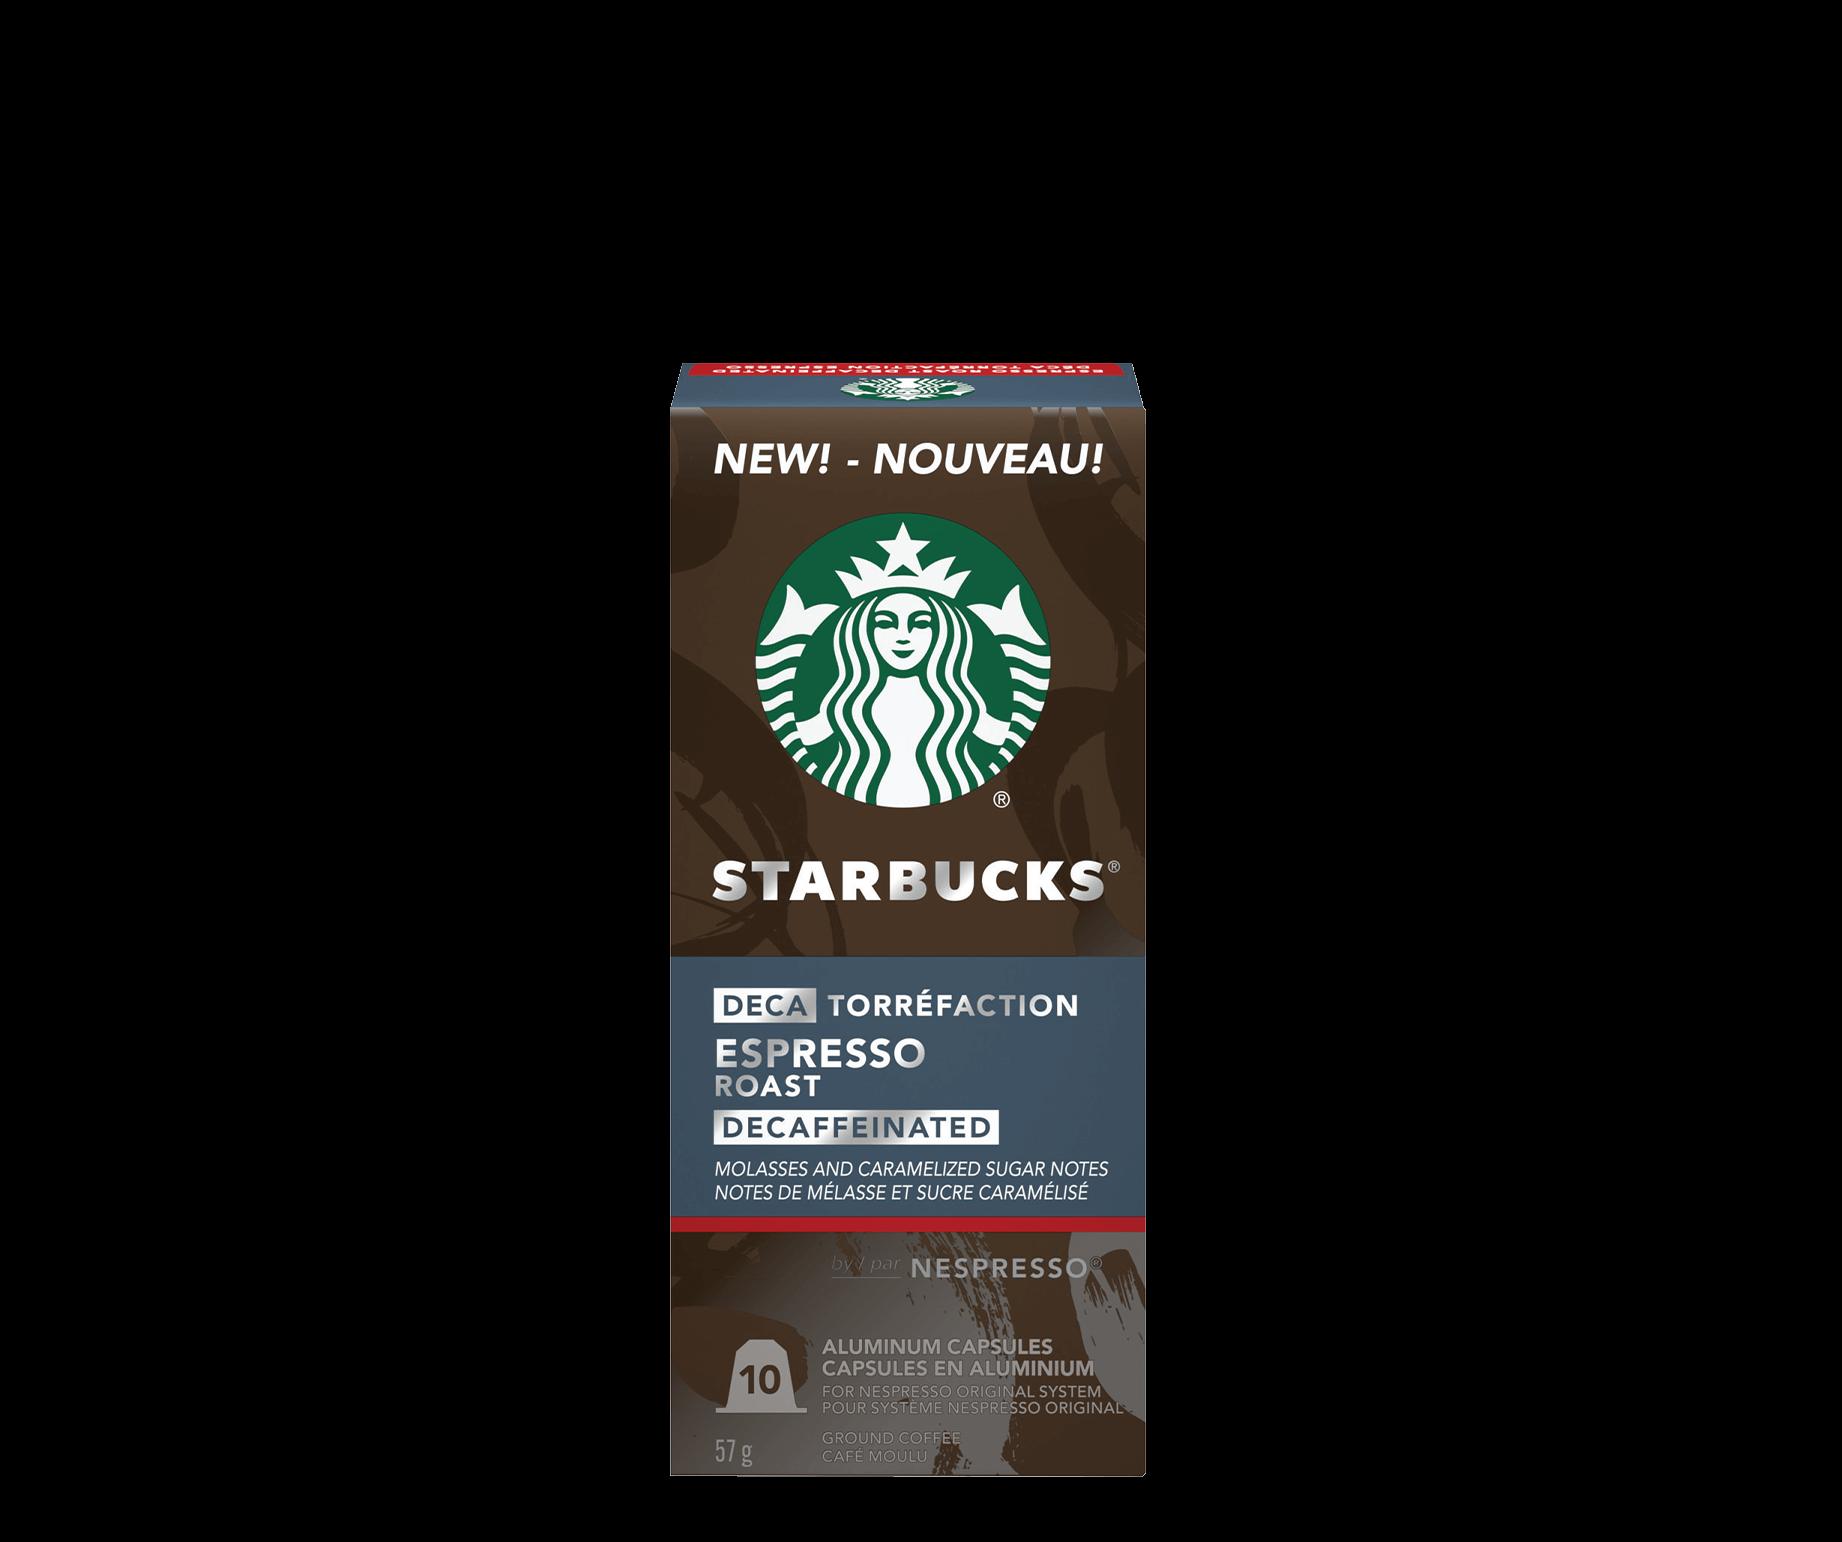 SBUX_LongShadow_Nespresso_20210319_Decaf